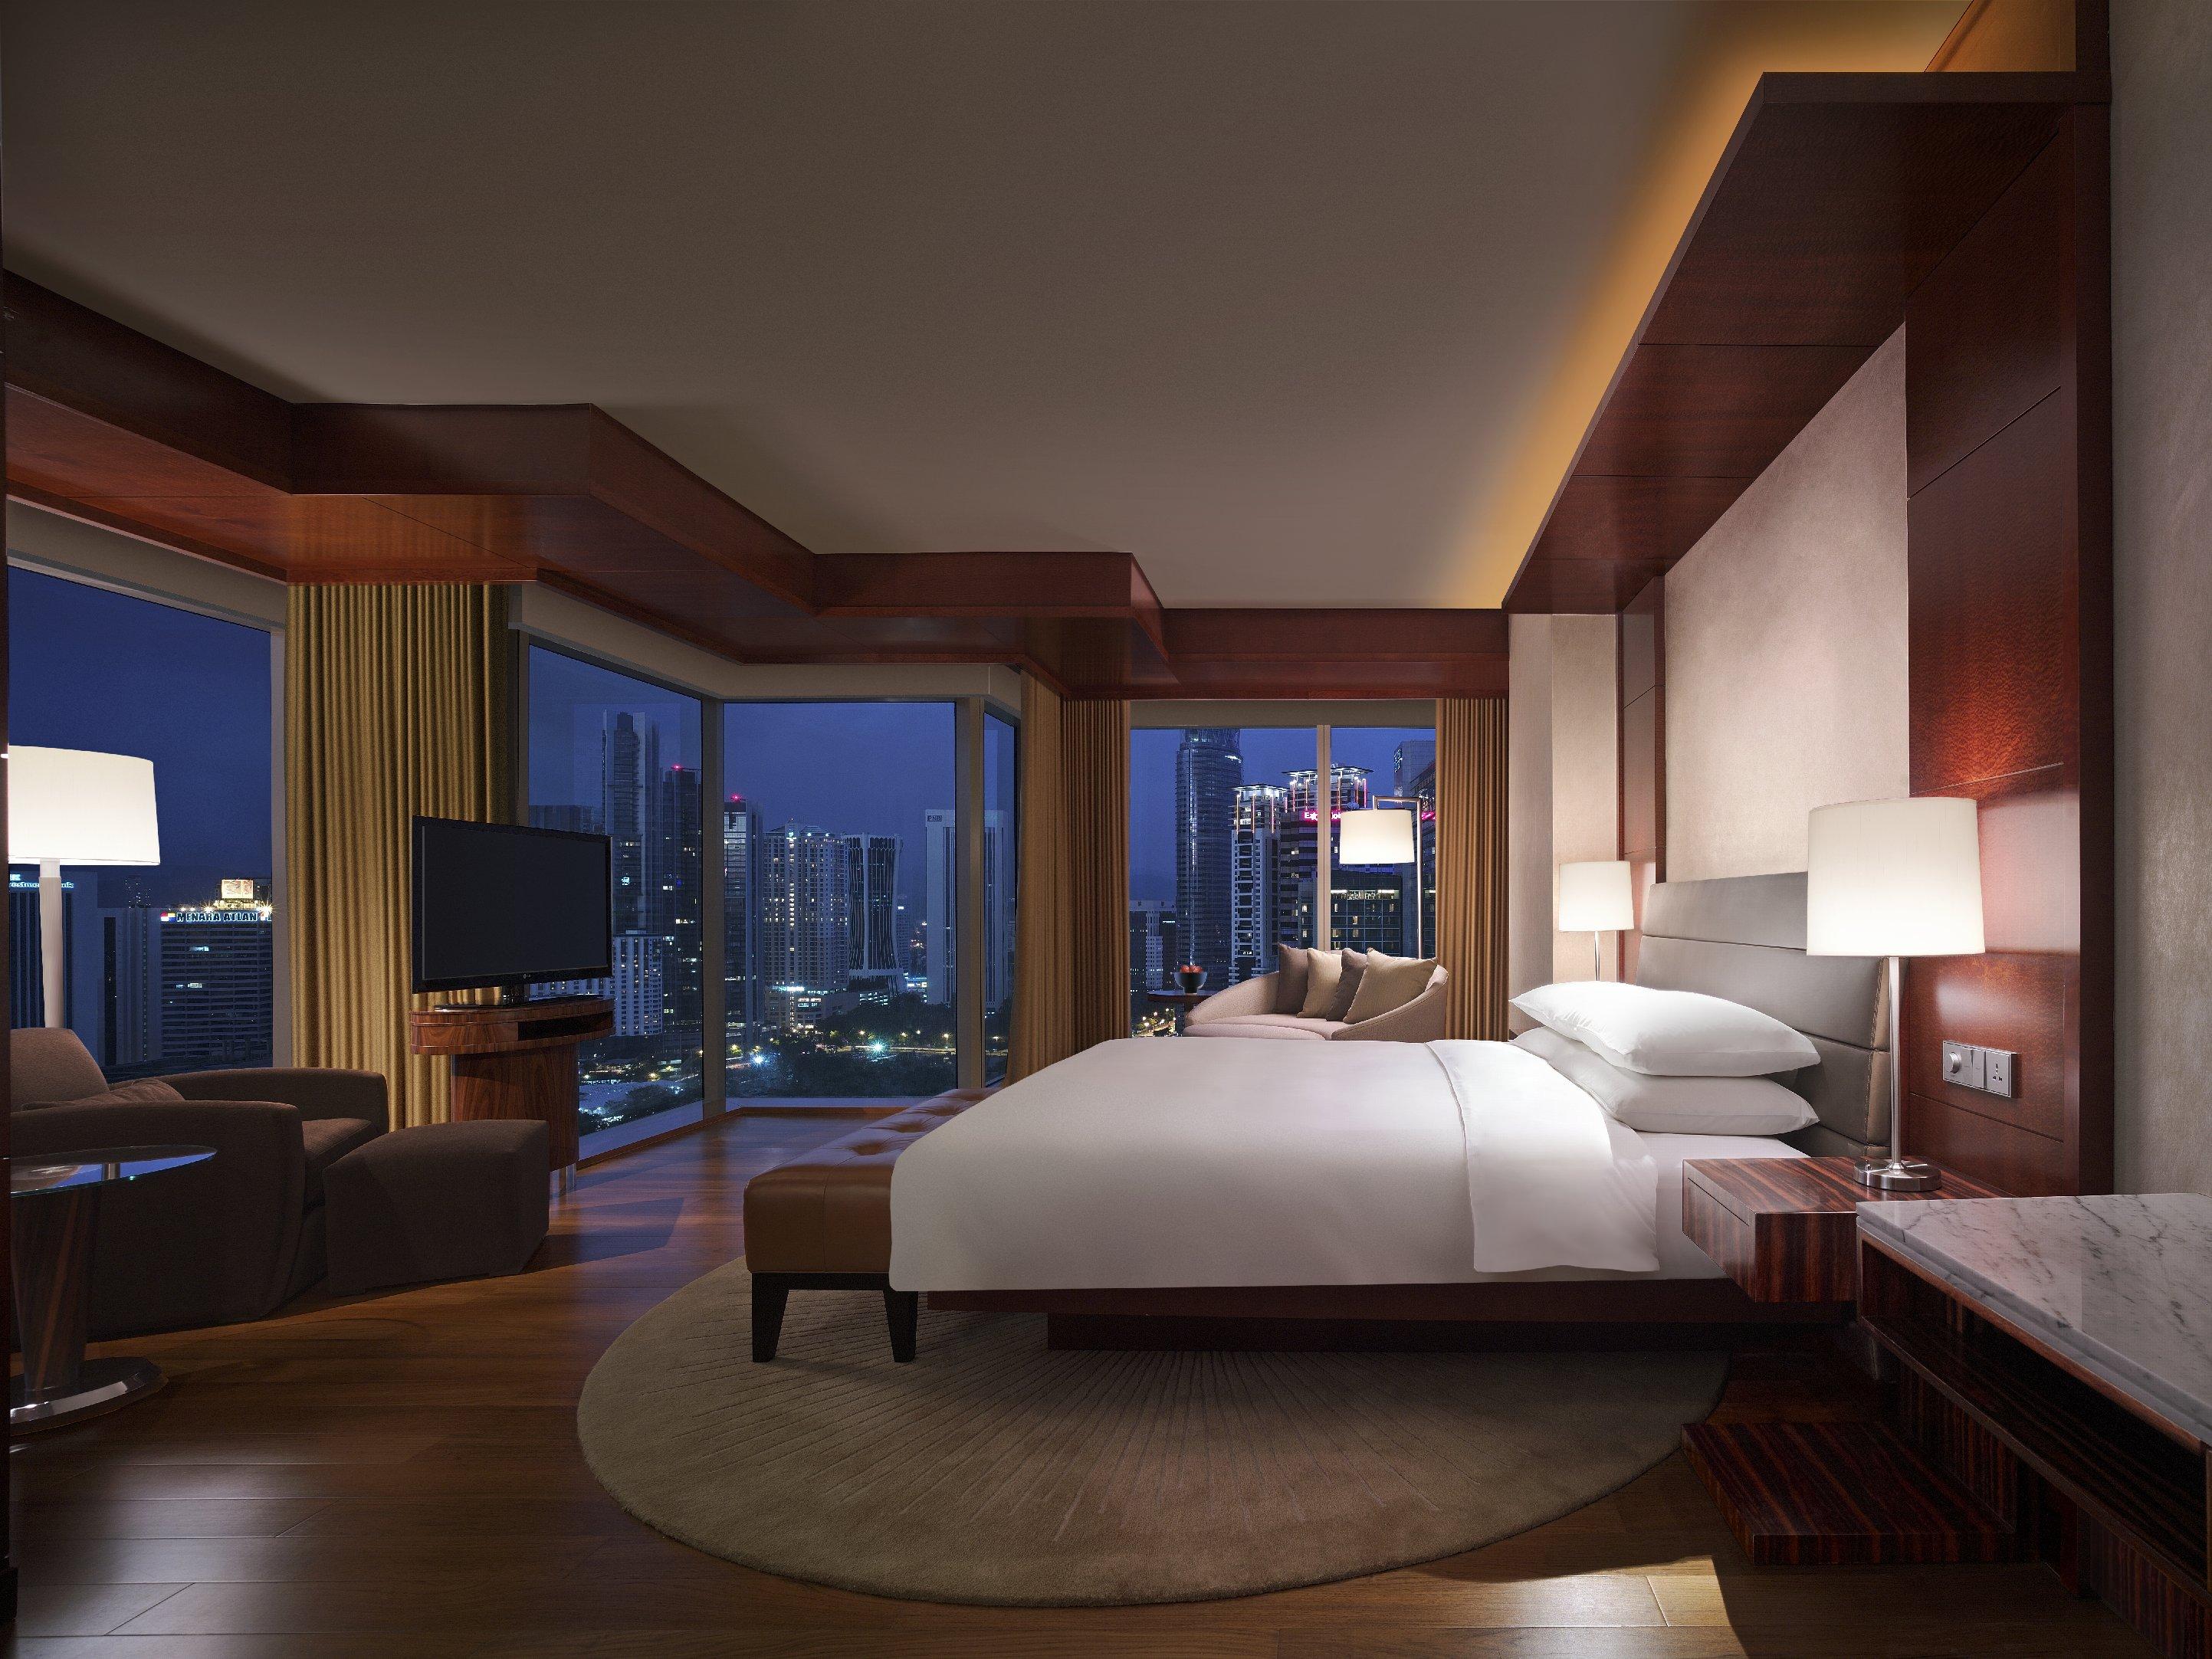 Hyatt hotels opens new grand hyatt kuala lumpur in malaysia for Design hotel kuala lumpur